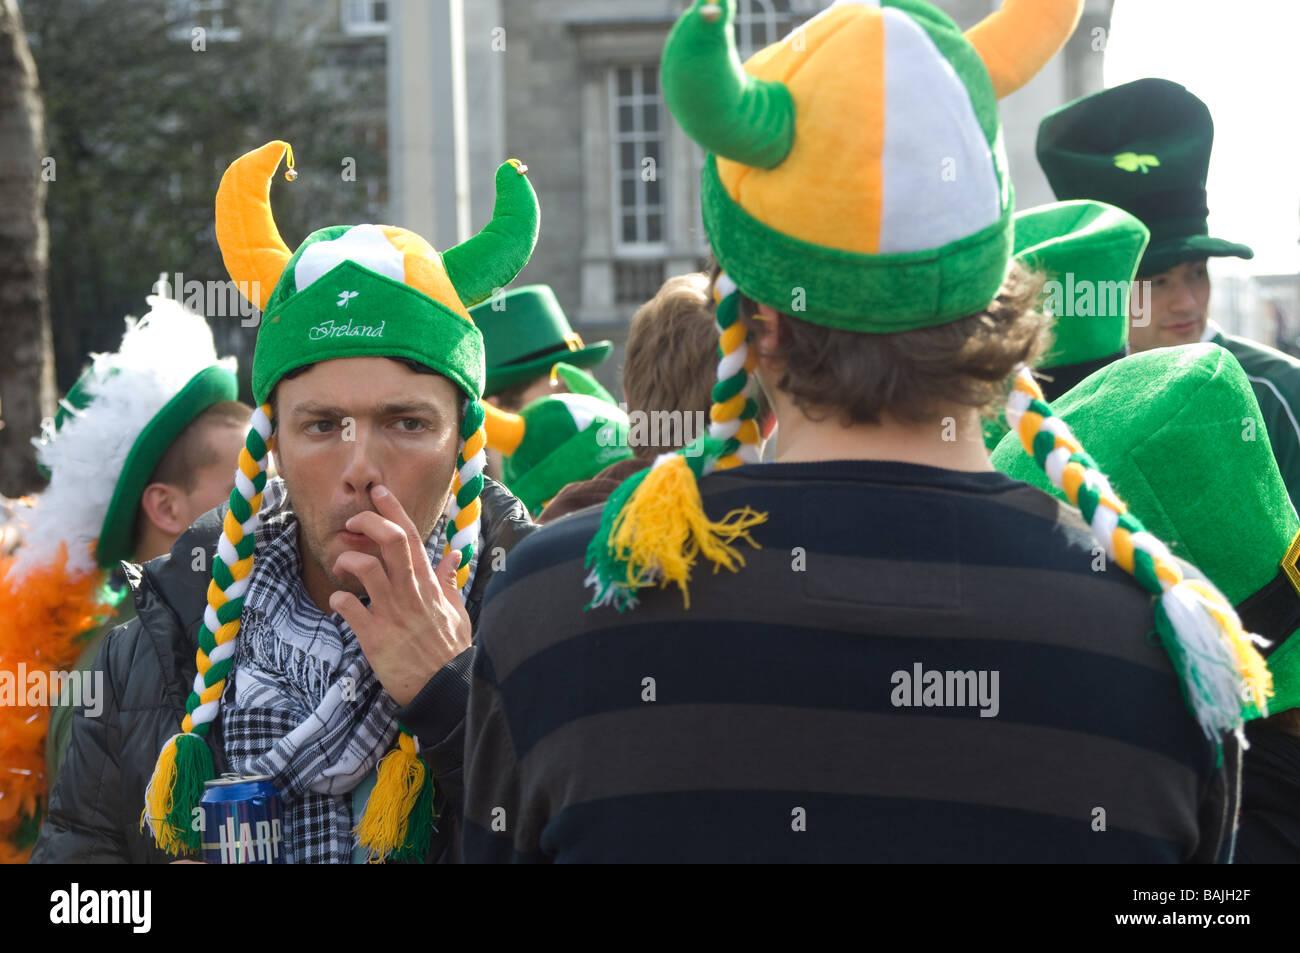 Men wearing viking hats in crowd at St Parick's Day parade, Dublin, Ireland Stock Photo